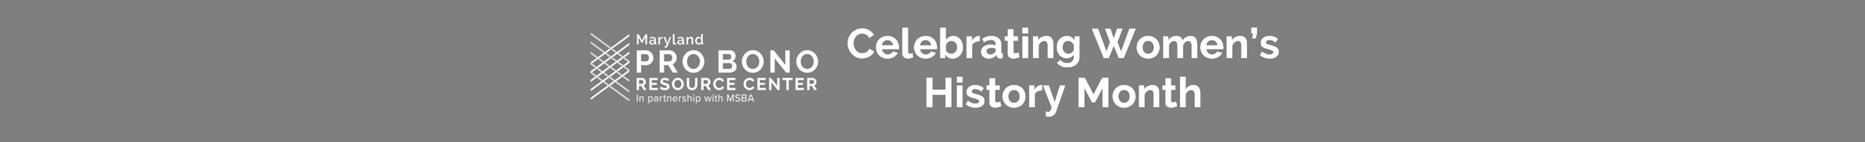 WomensHistory Banner